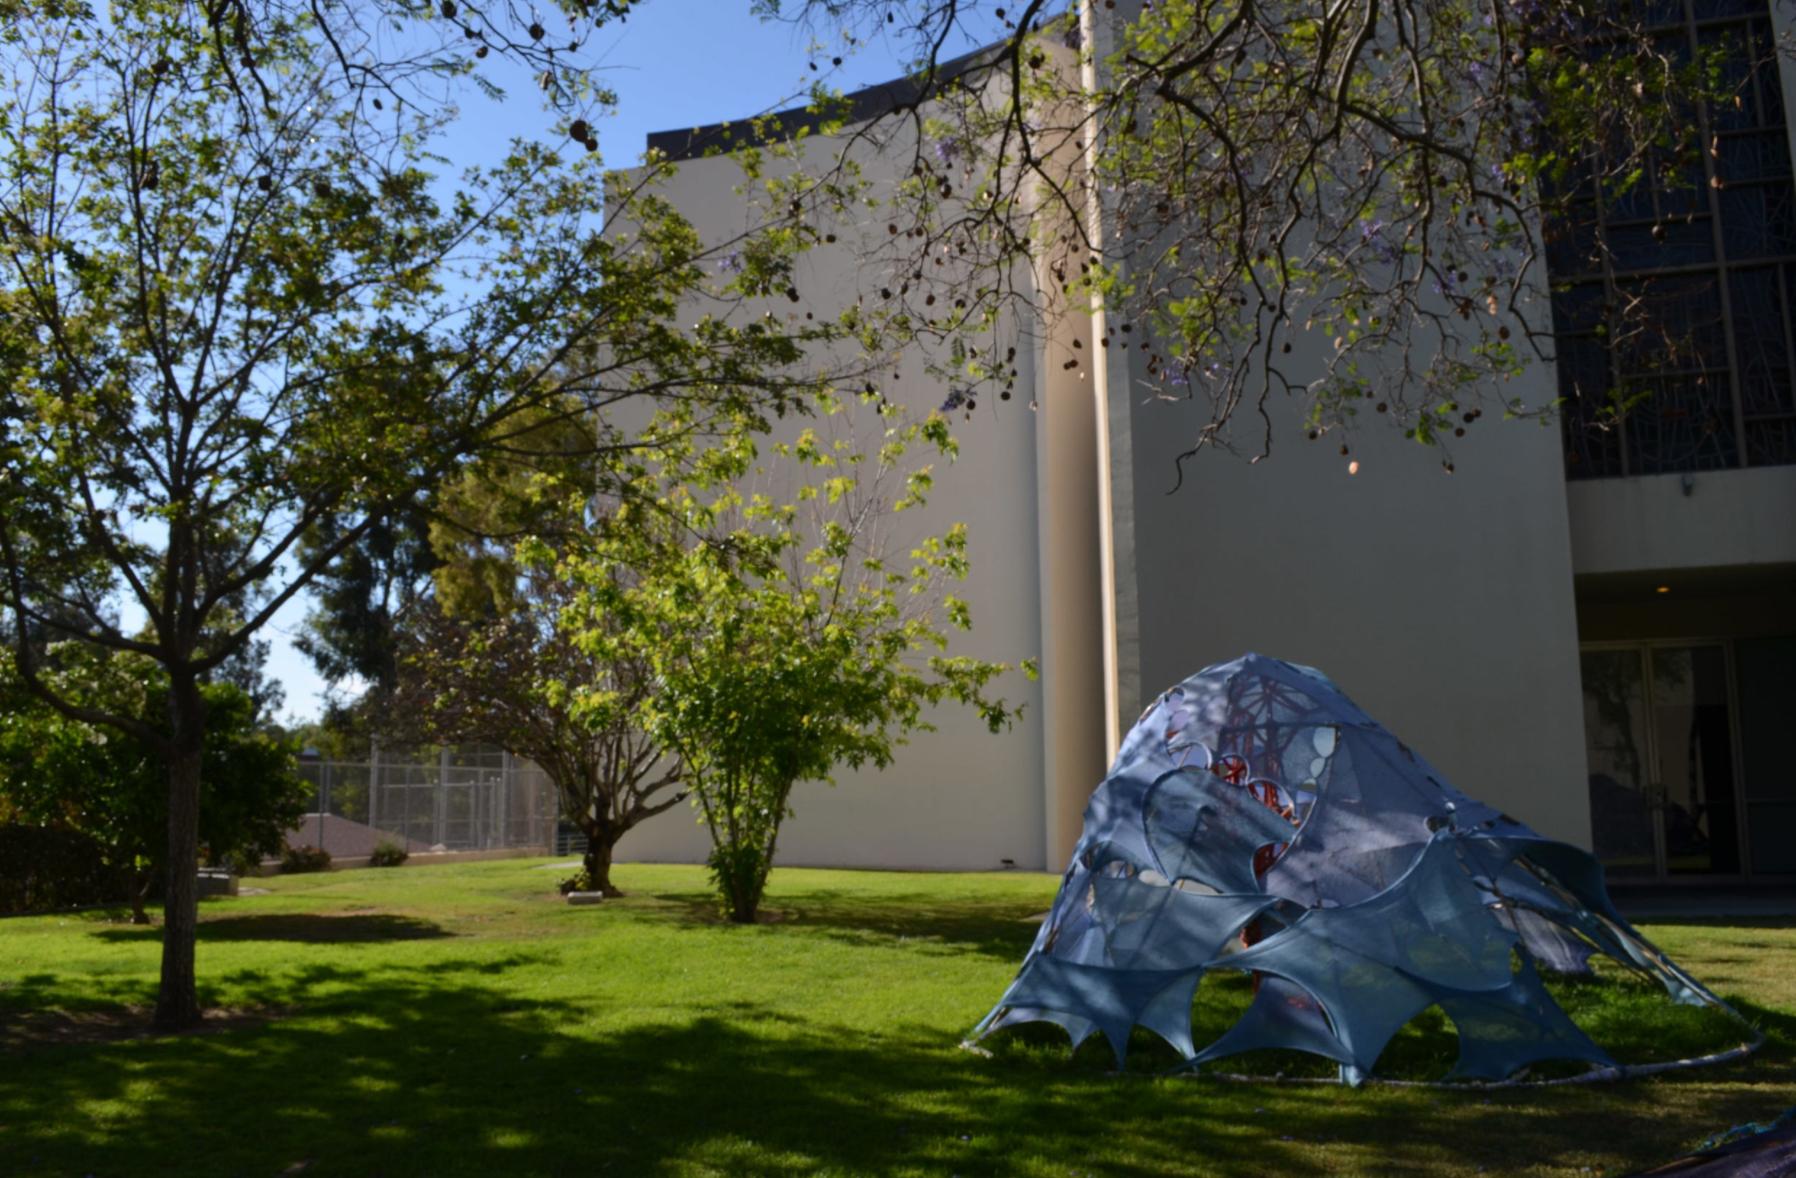 Jacqueline-Surdell-Artist-Installation-Tents-10.jpg